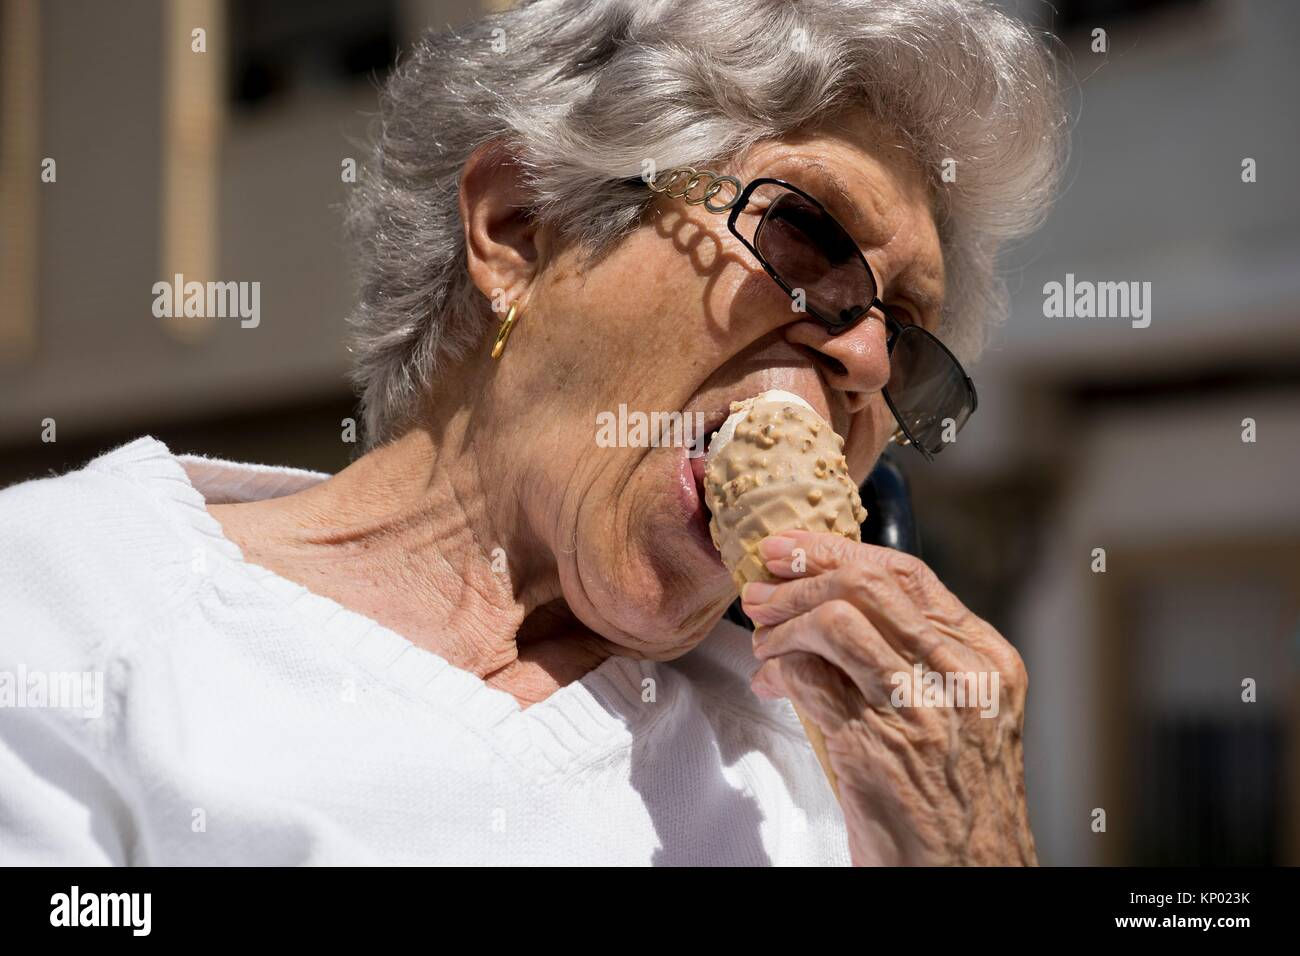 Grandmother eating ice cream, Valencia - Stock Image